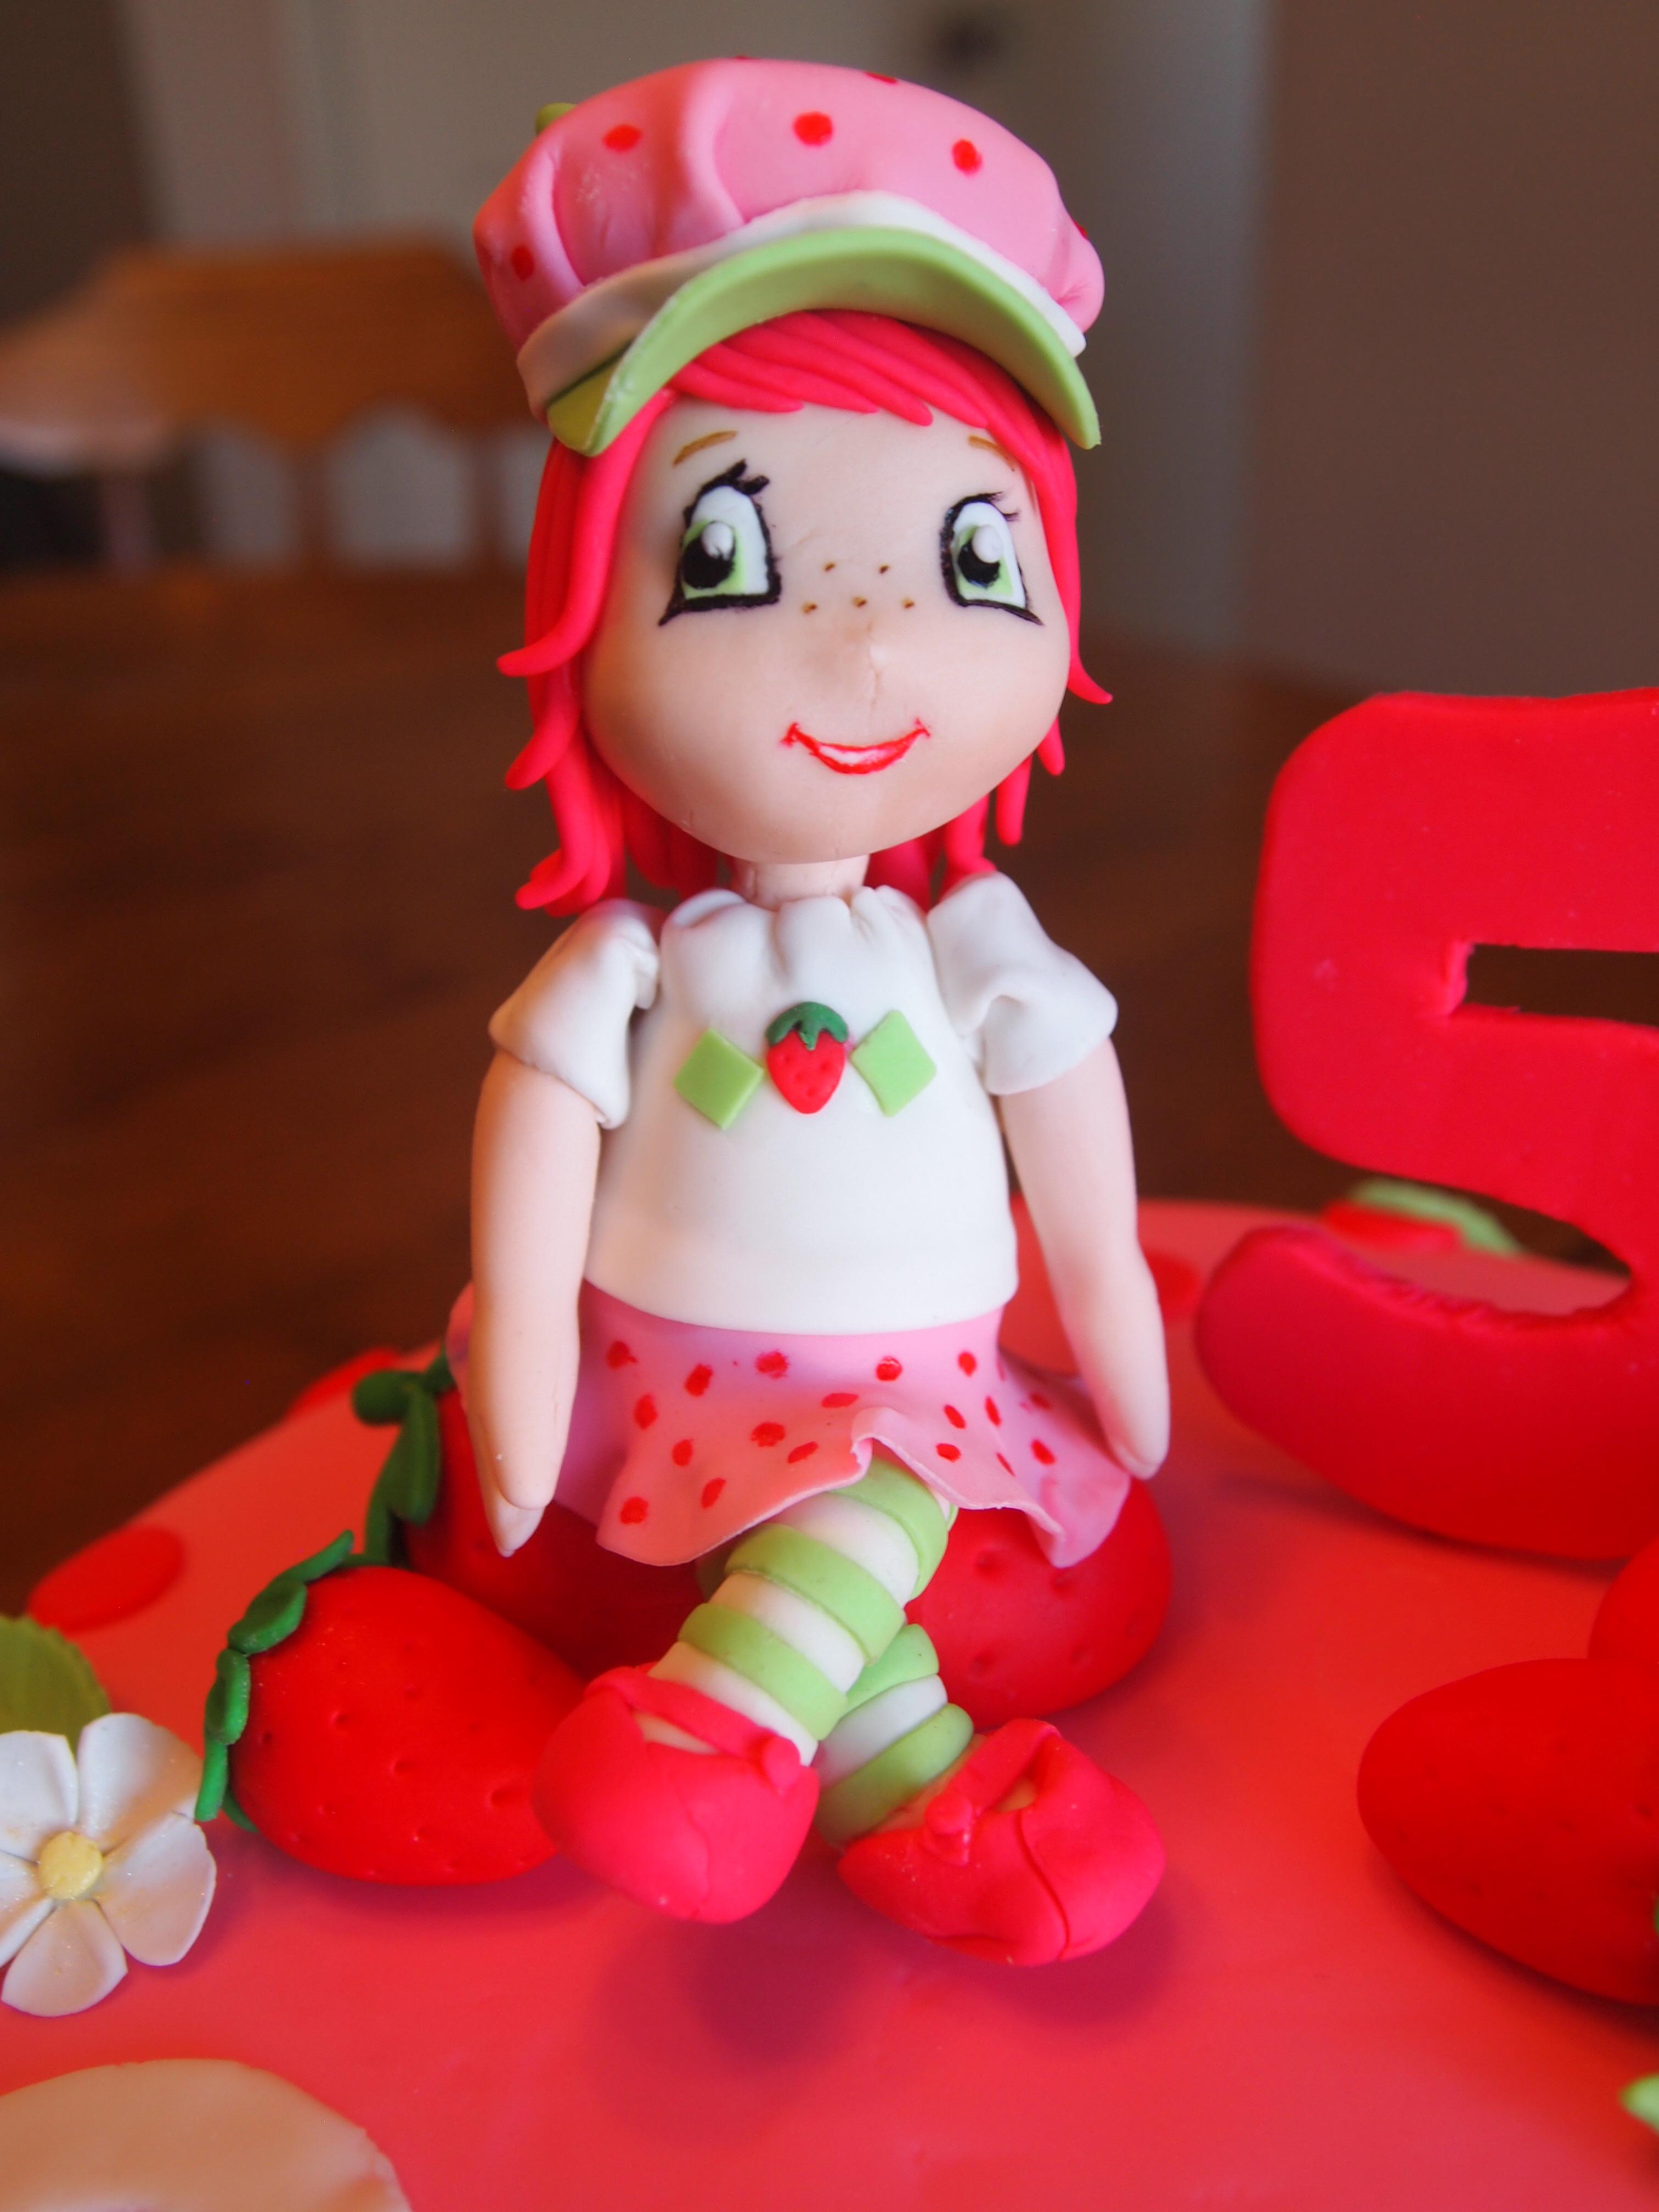 Strawberry Shortcake Figurine